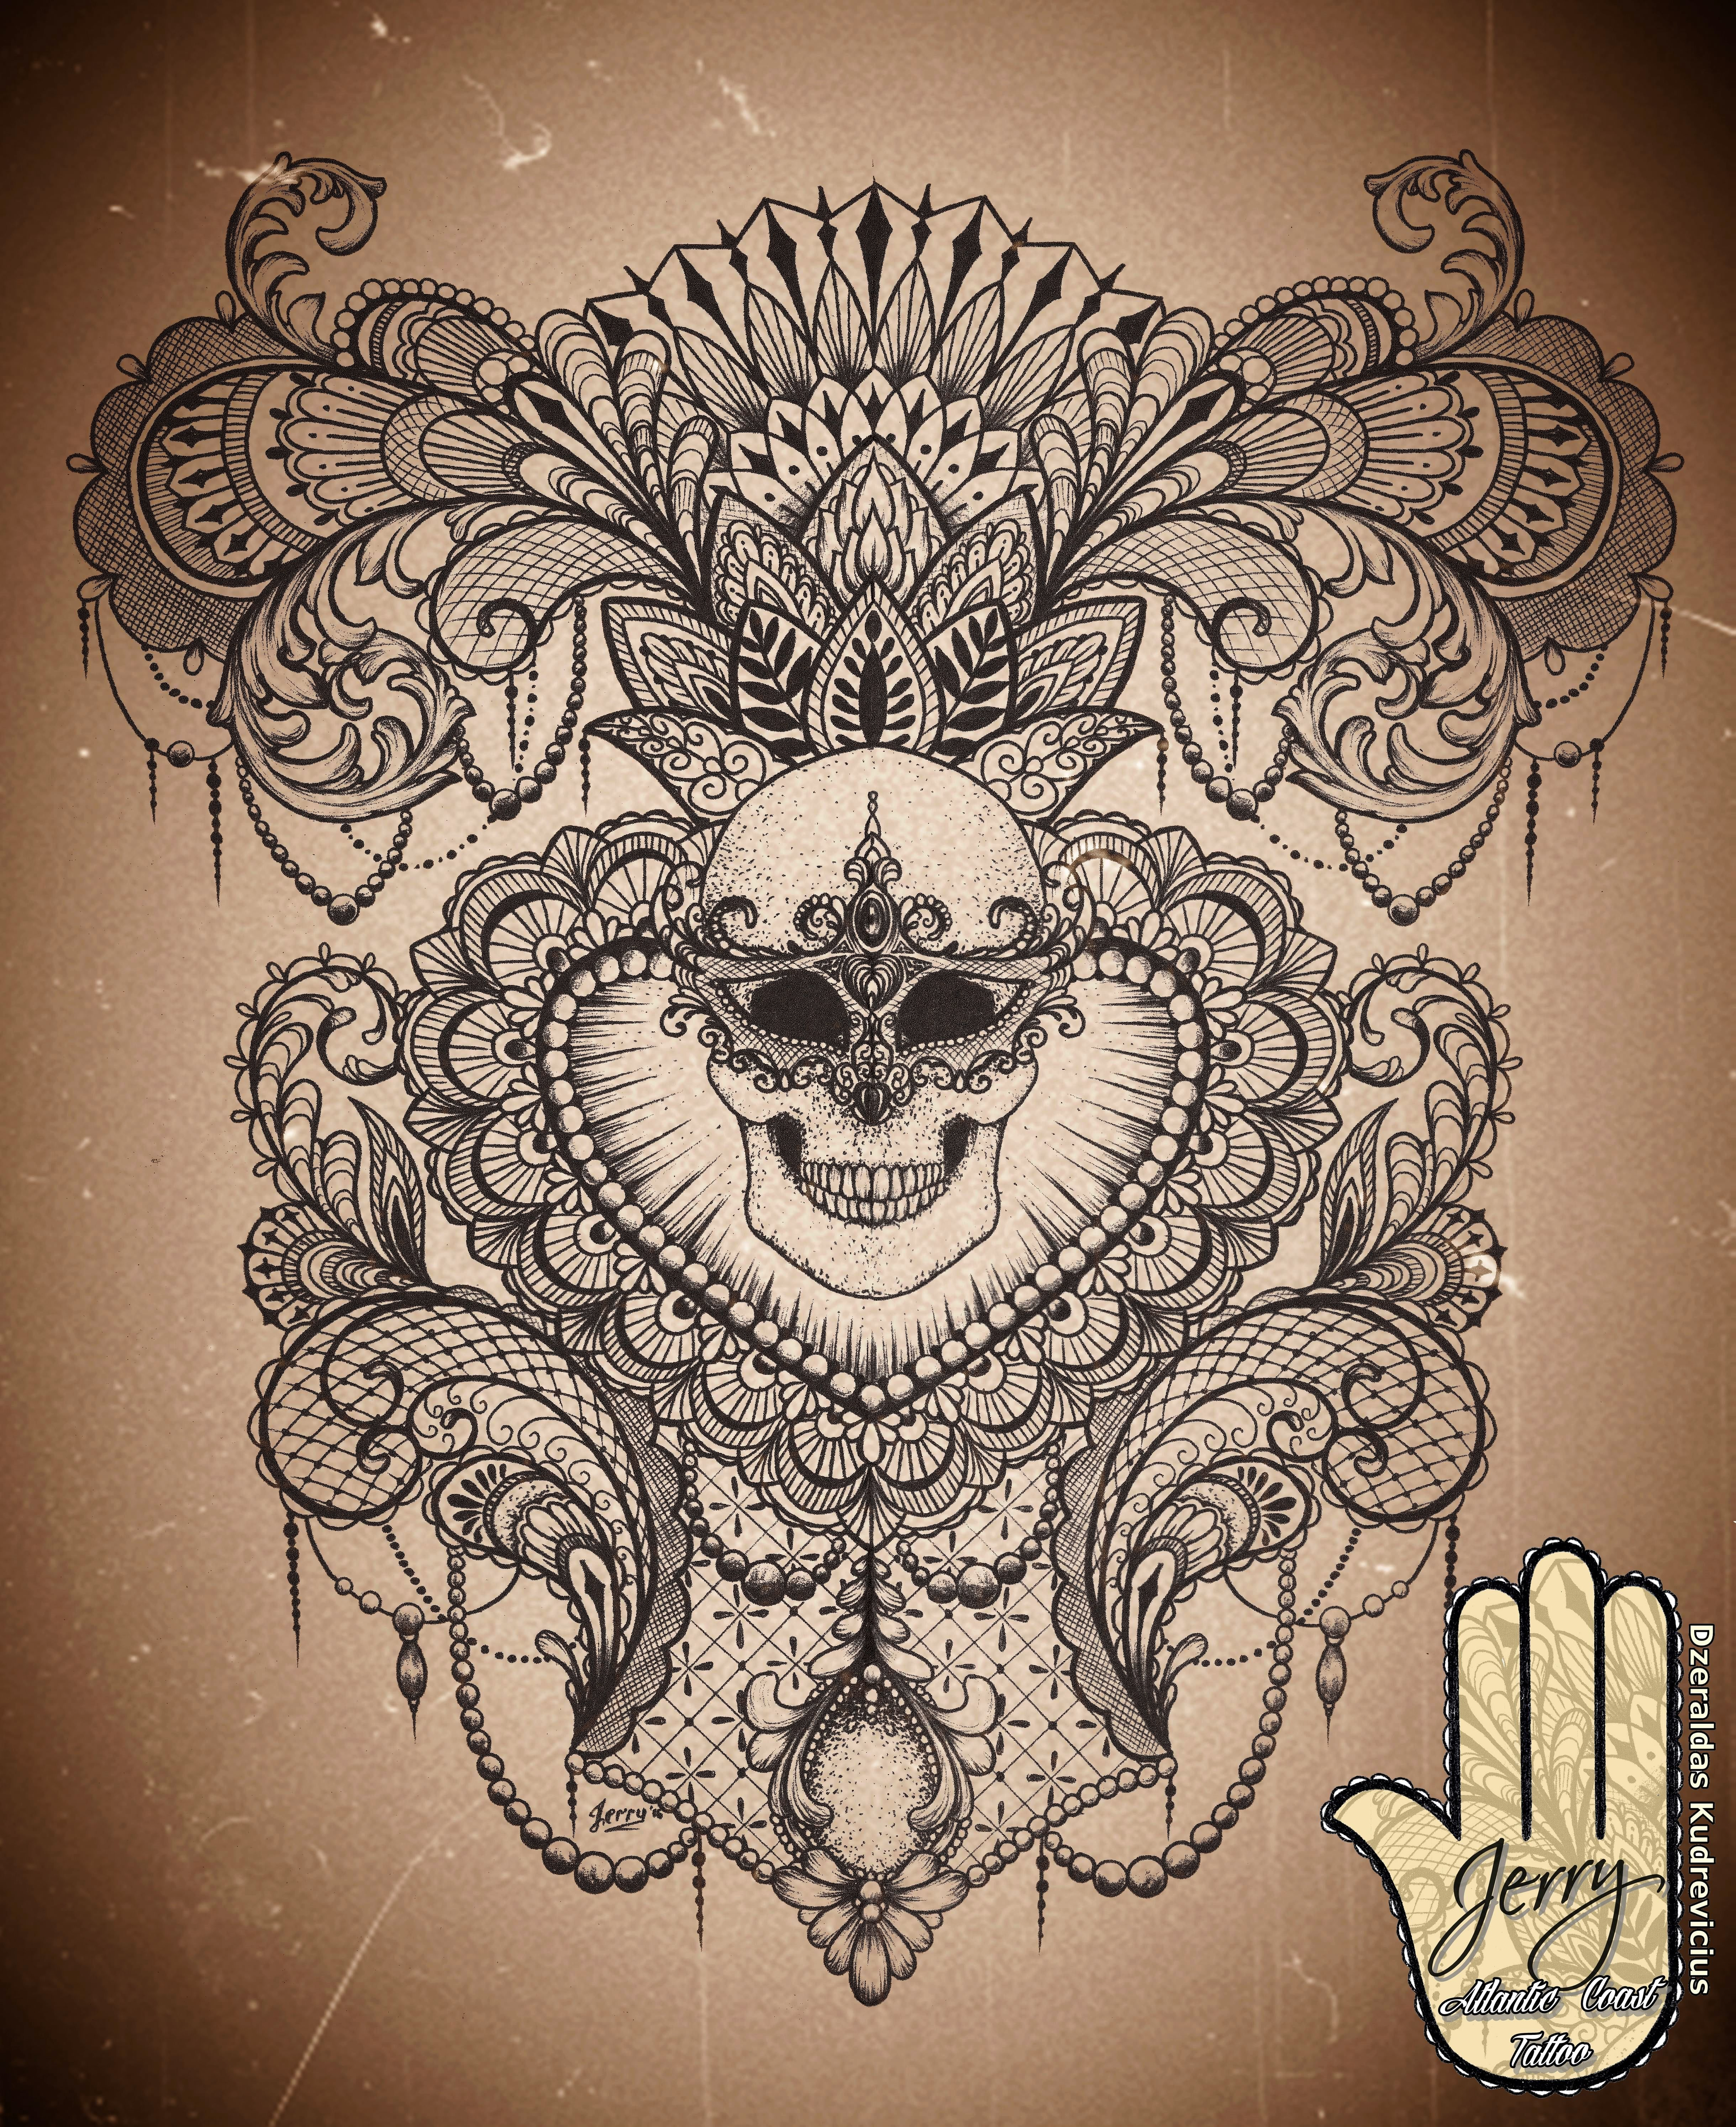 Feminine Back Piece Tattoo Idea Design Skull With Mandala And Lotus Design Beautiful Lace And Mendi Patter Back Piece Tattoo Lace Tattoo Design Pieces Tattoo